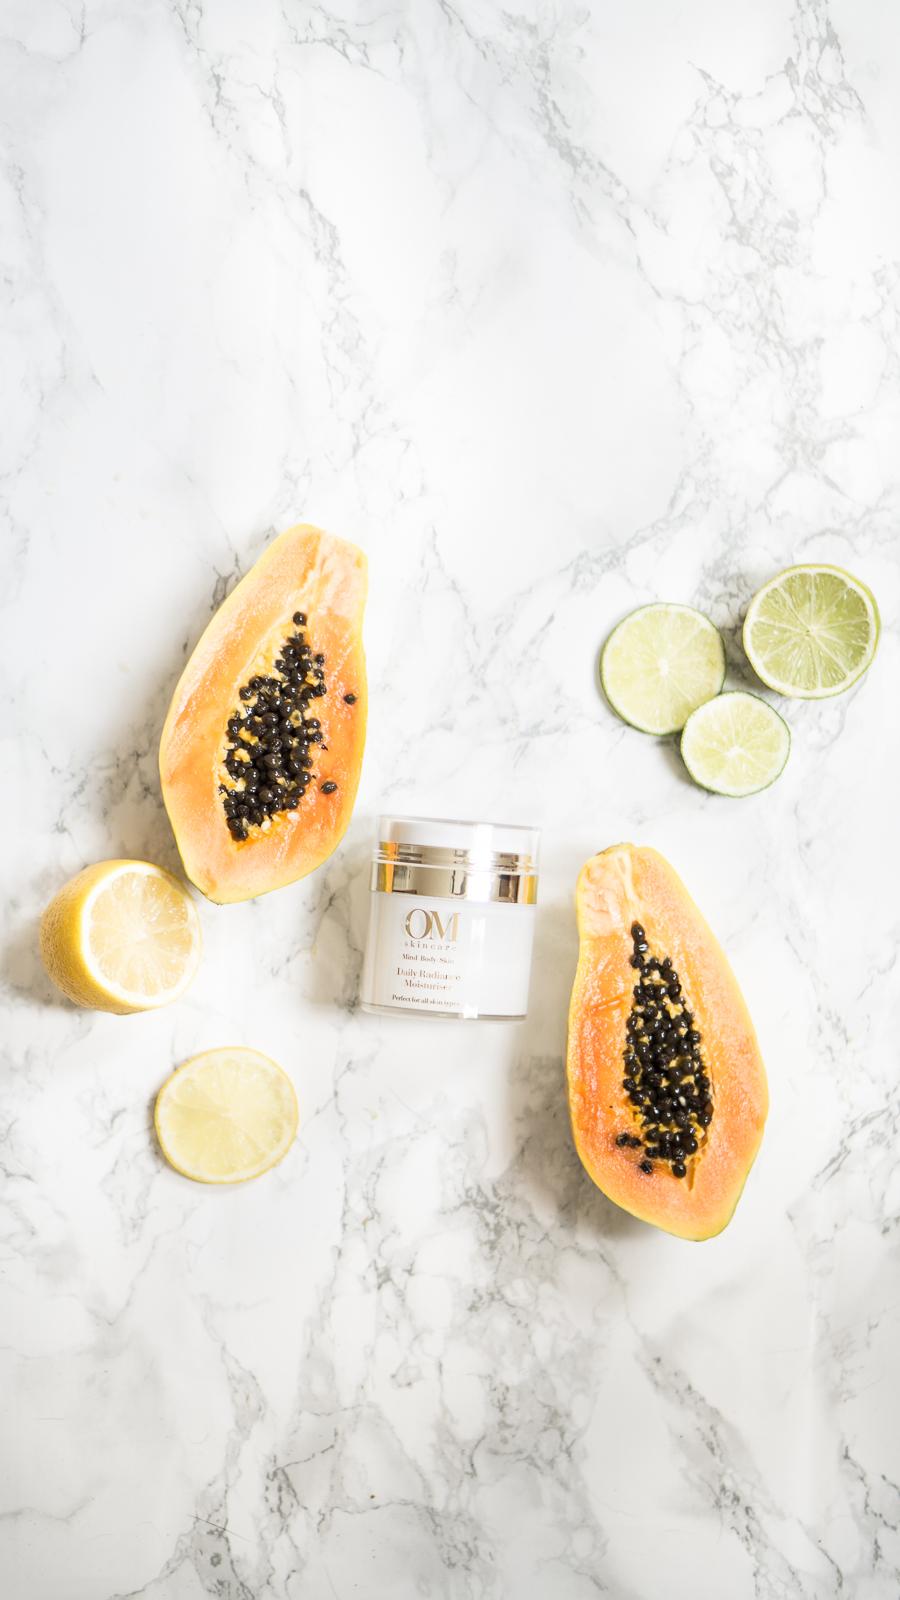 Om Skincare Product | Gloop